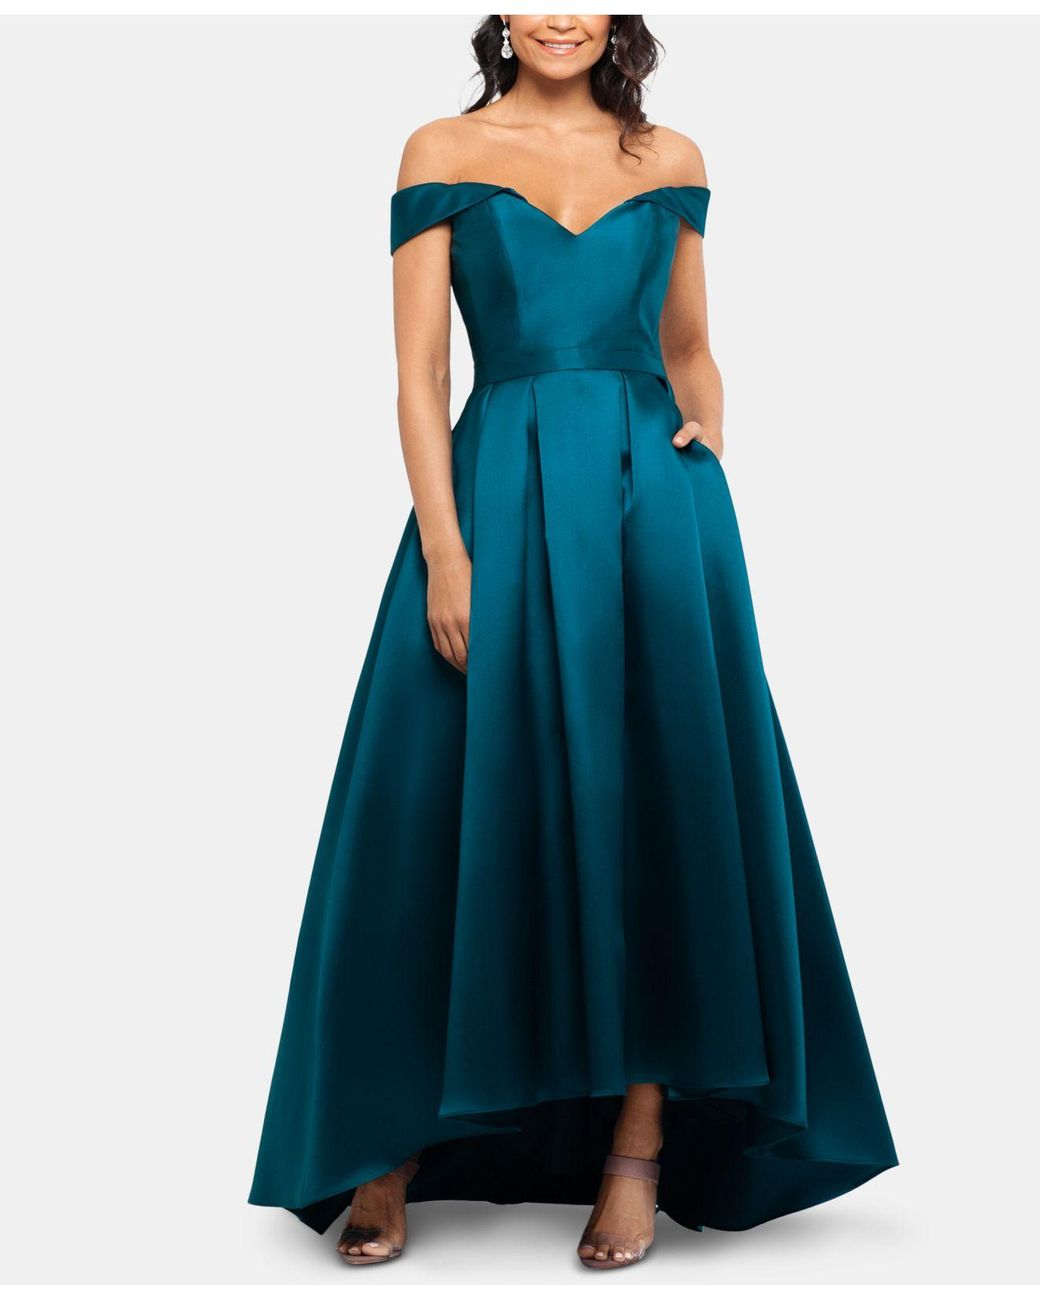 243ce7e6de7 Xscape Off-the-shoulder Sweetheart Gown in Blue - Lyst